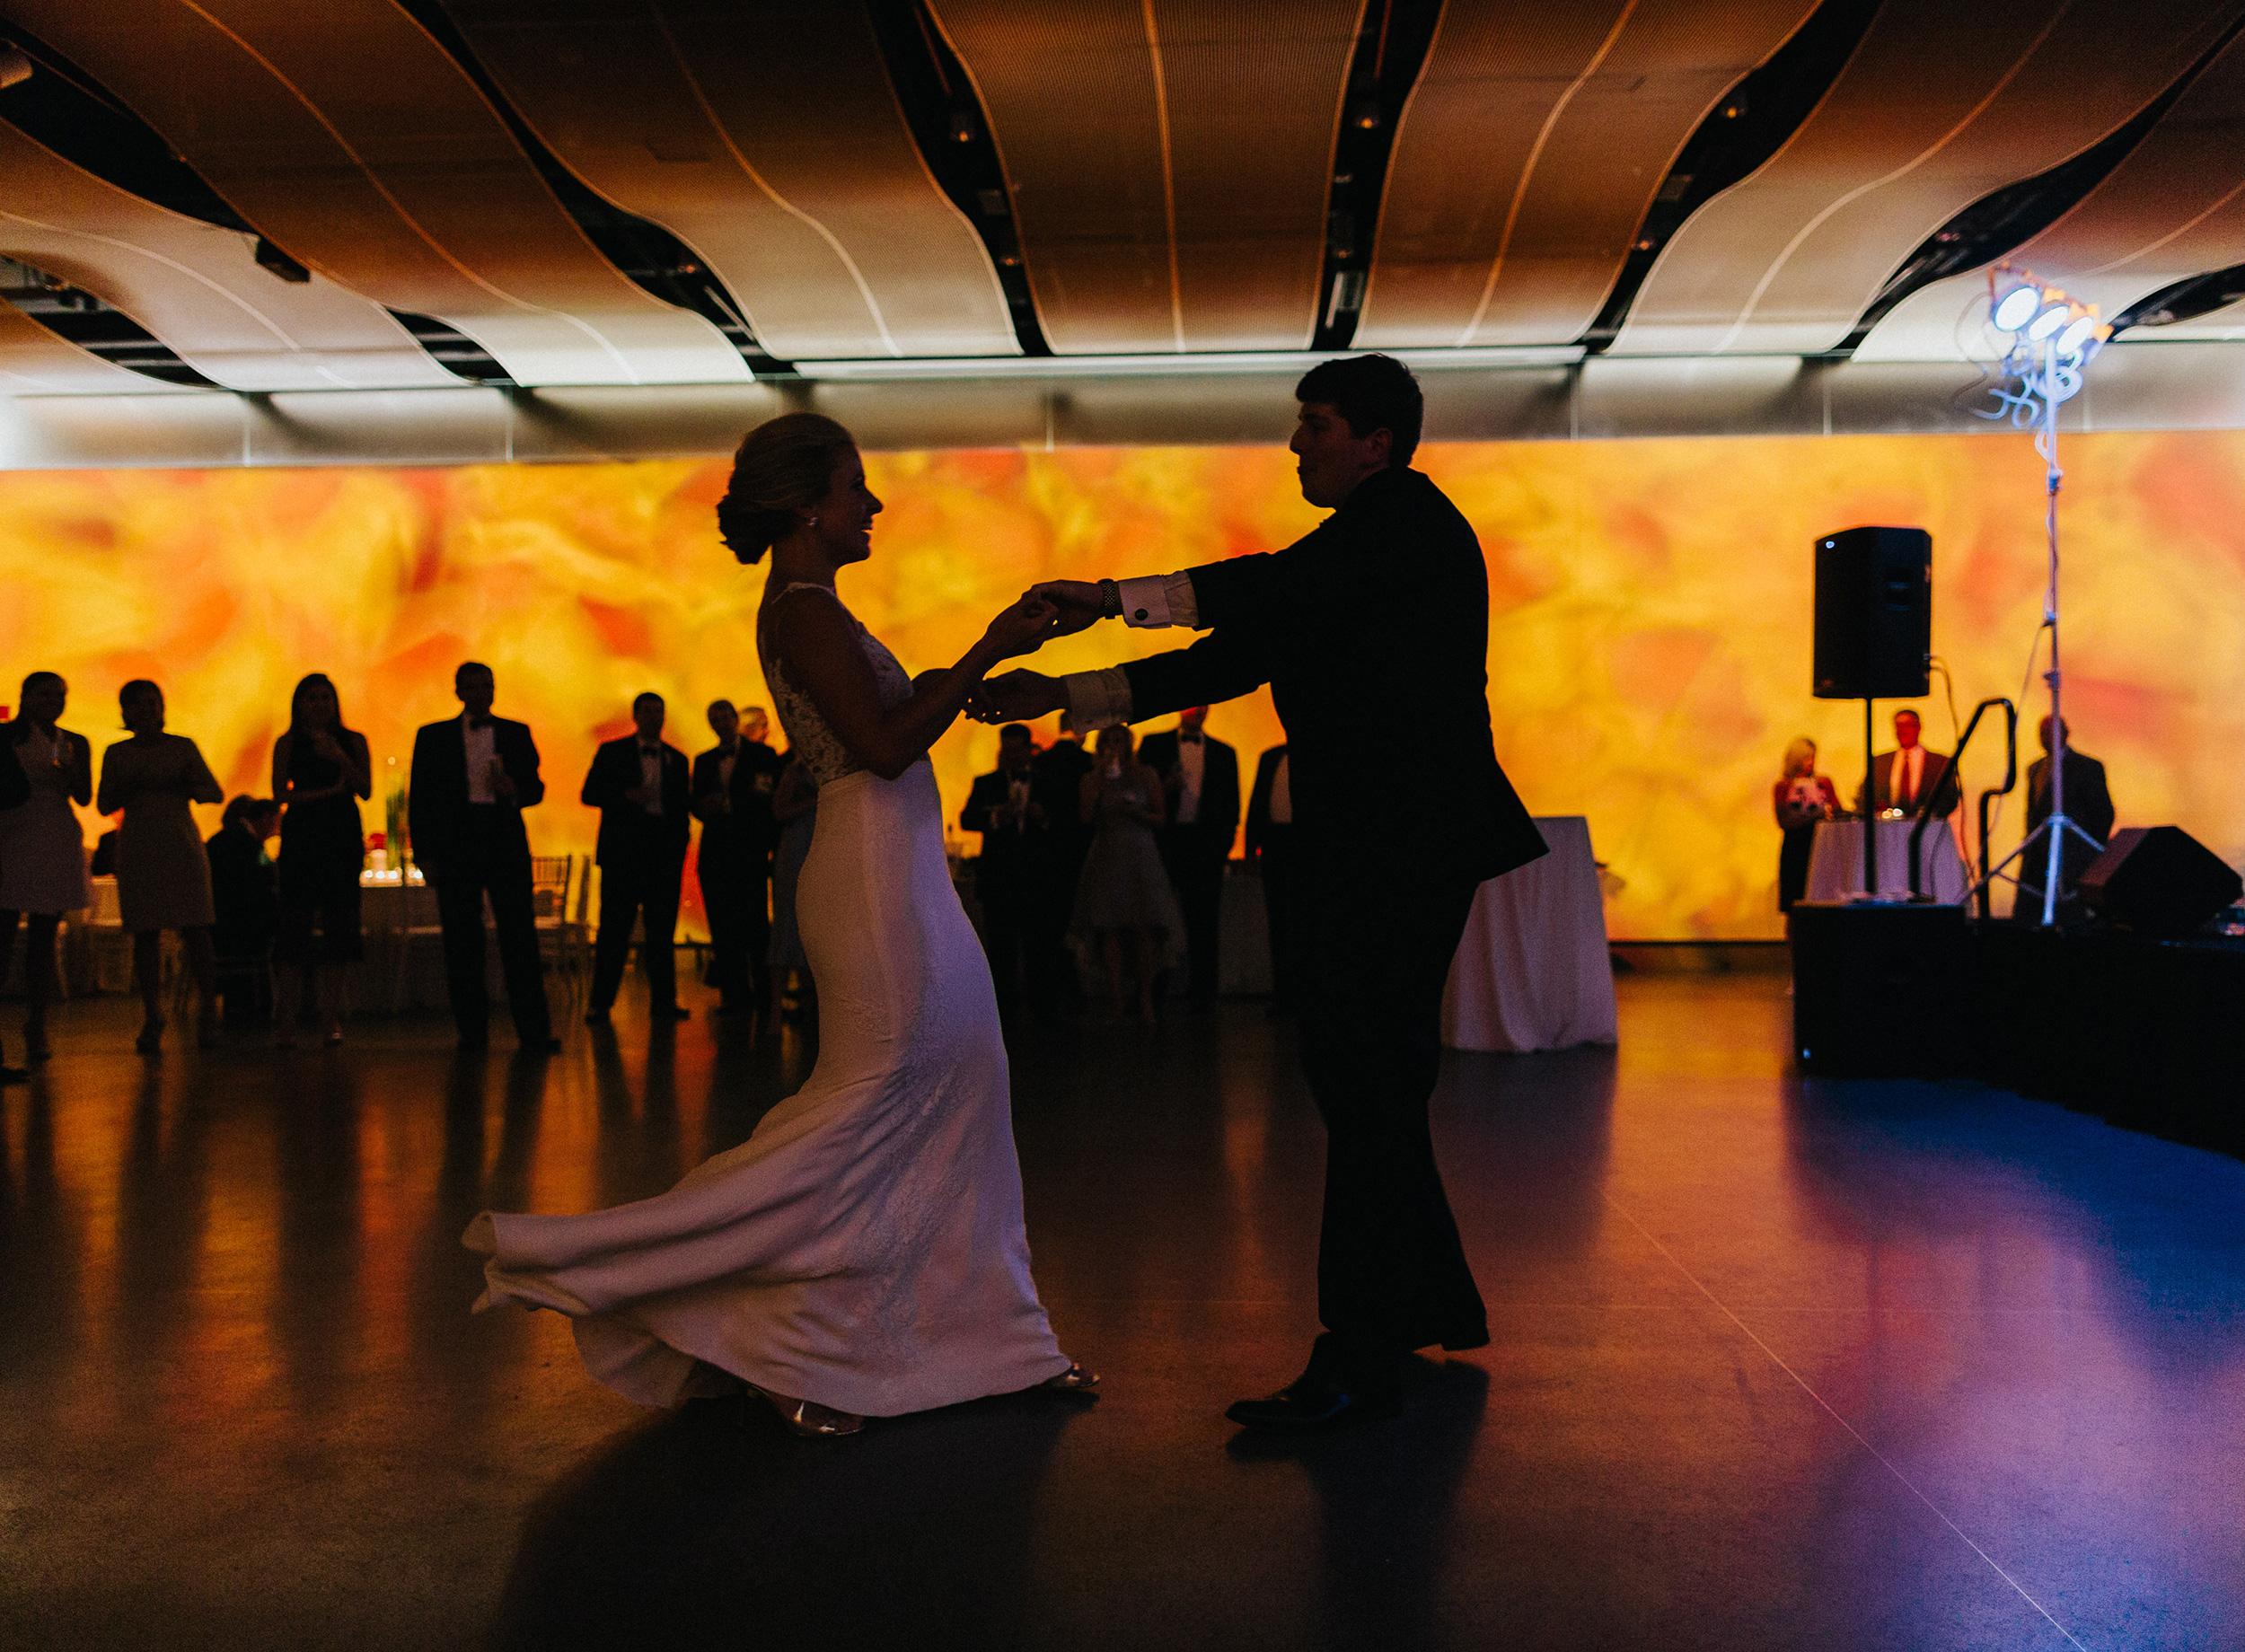 speed-art-museum-wedding-photographer-27.JPG